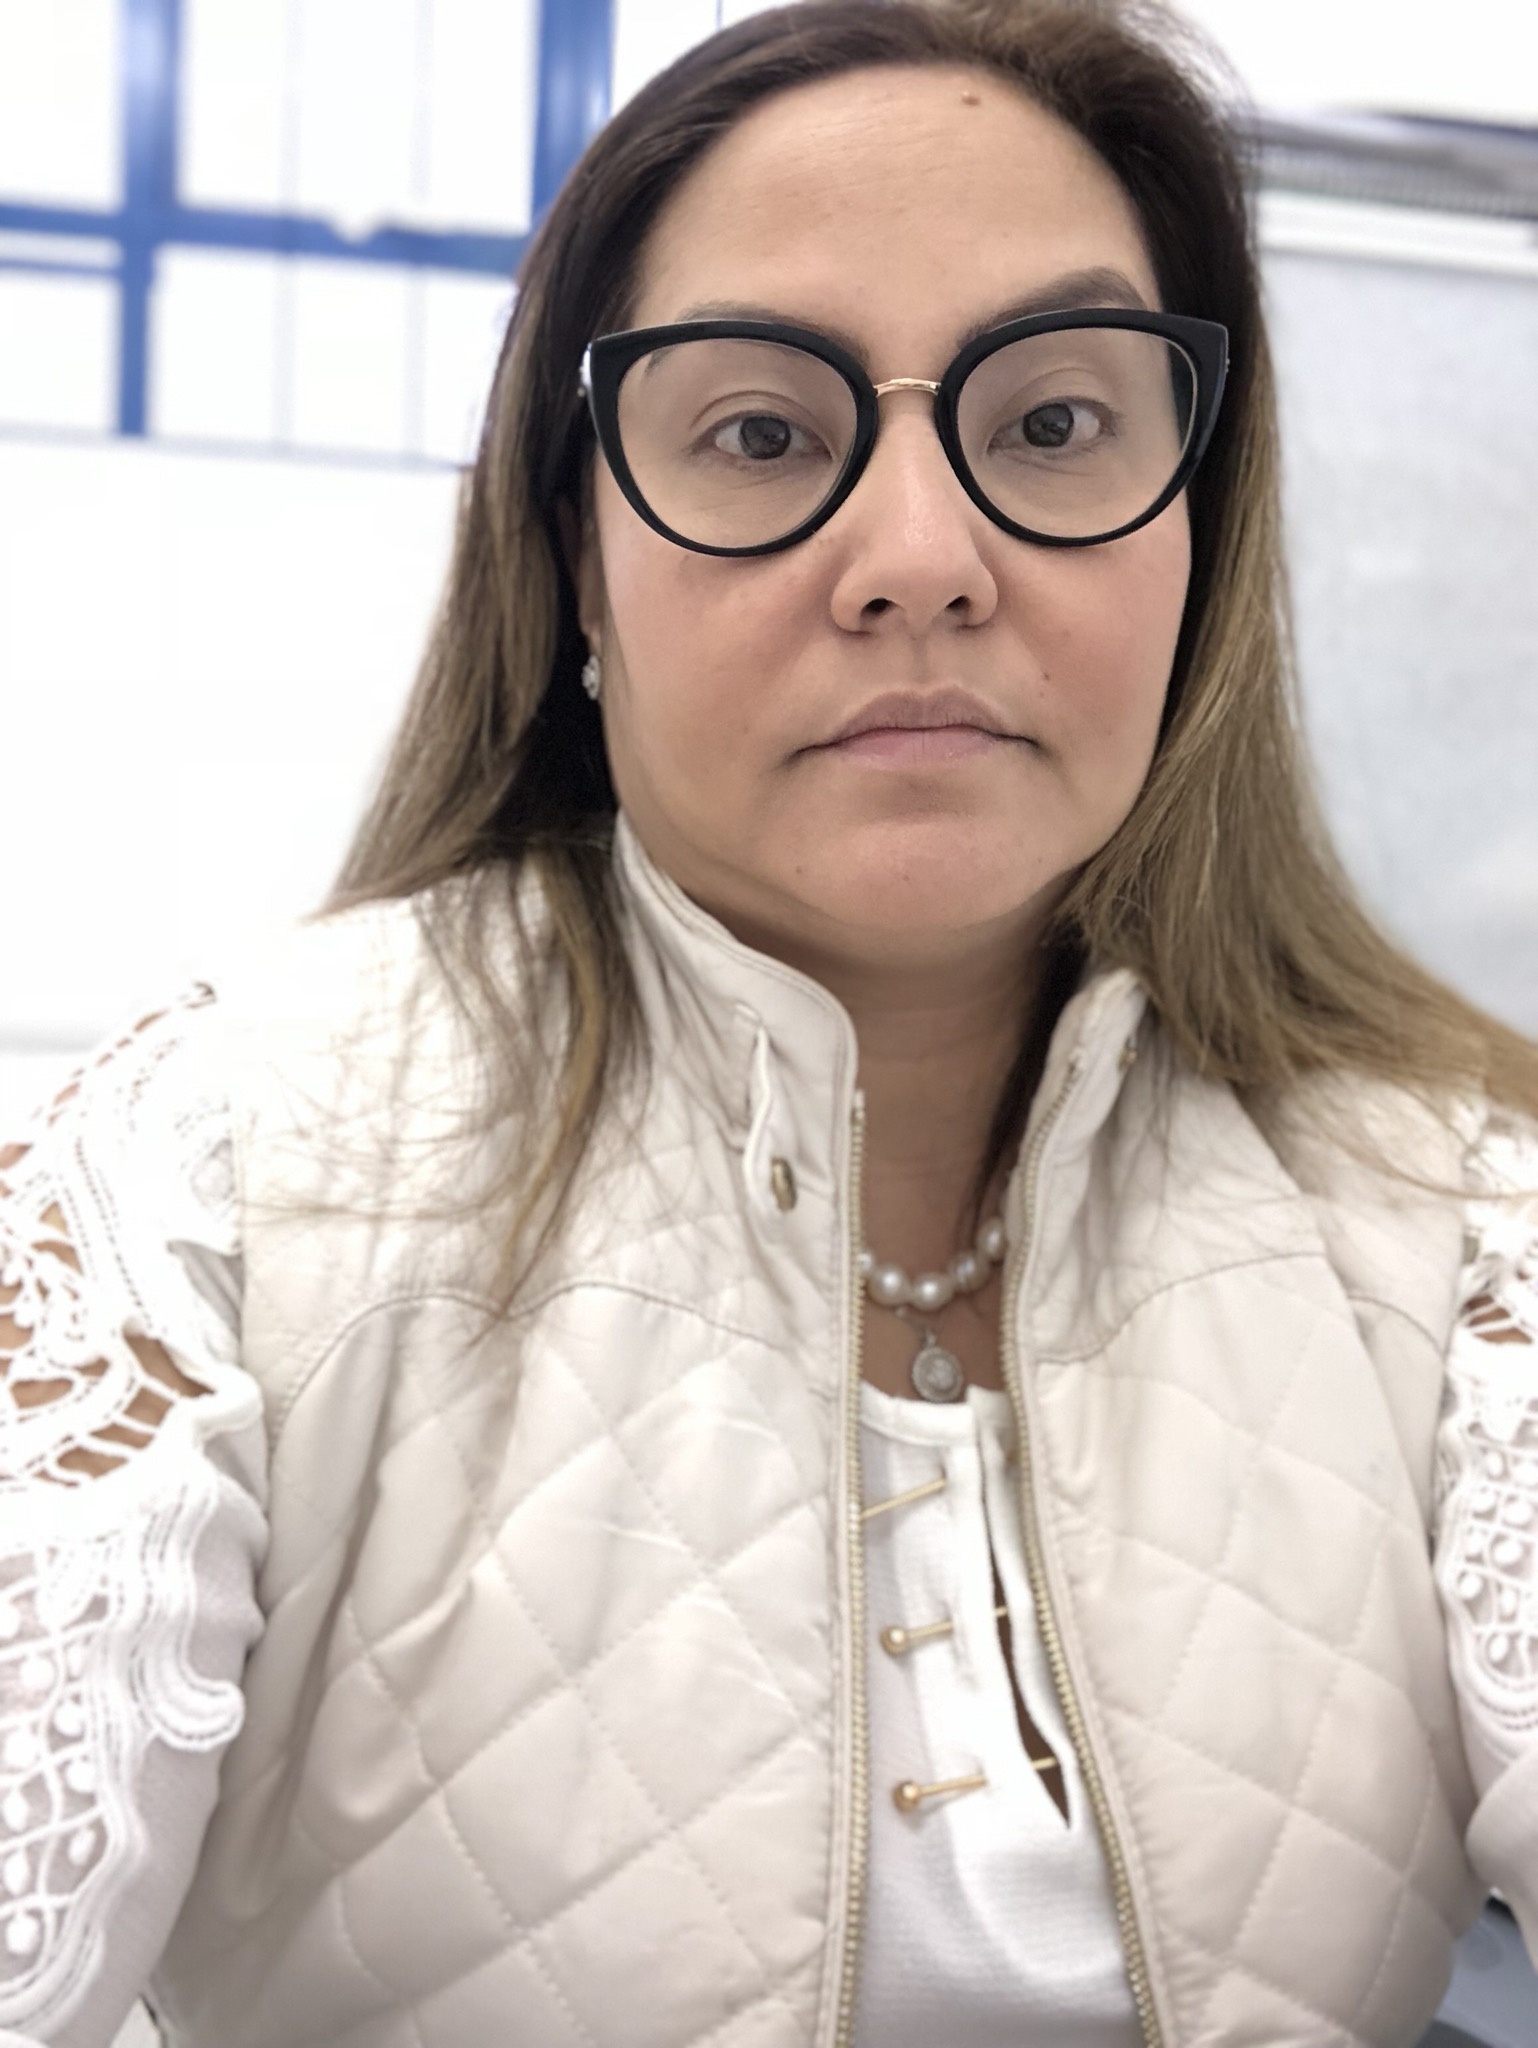 Helena cristina Ribeiro koharata santos